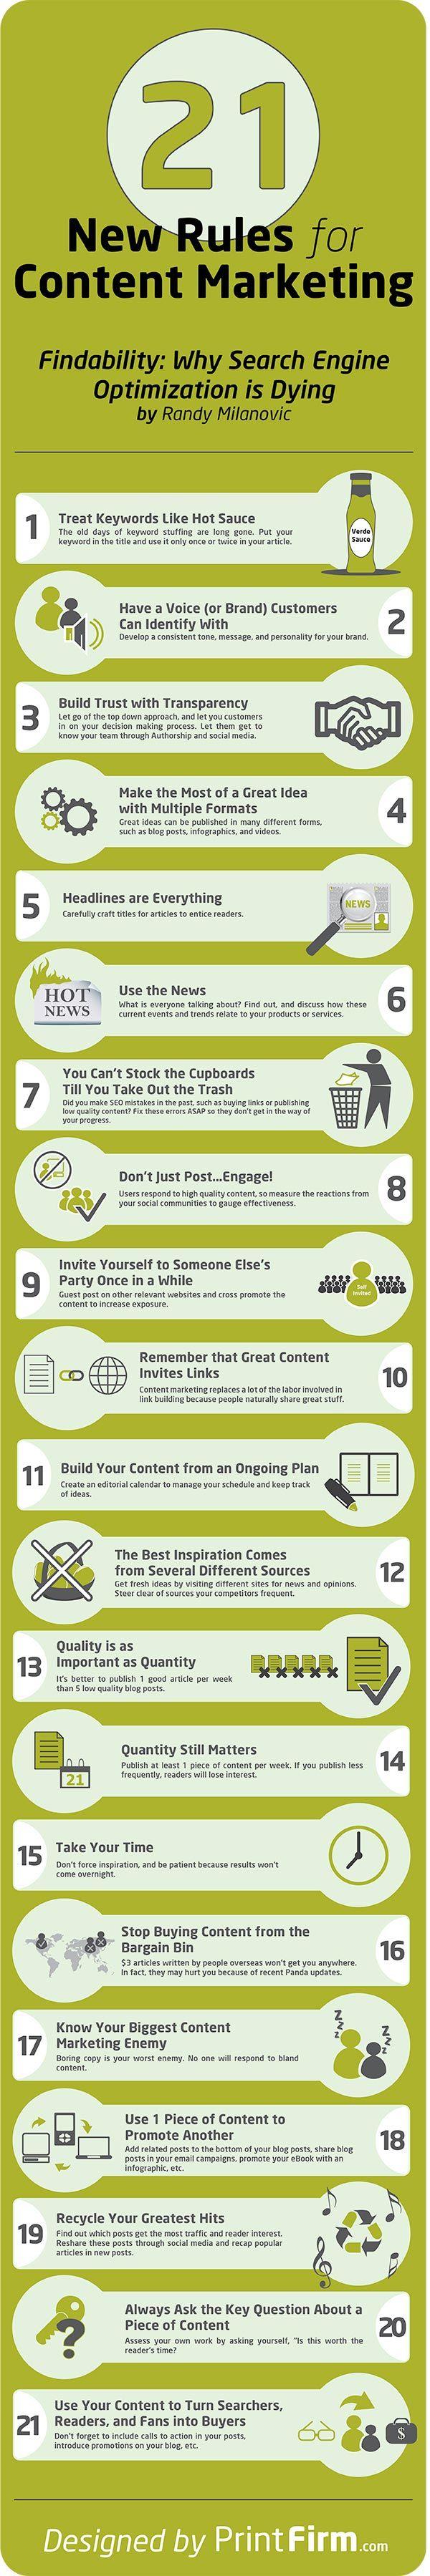 Contentmarketing.Engagement